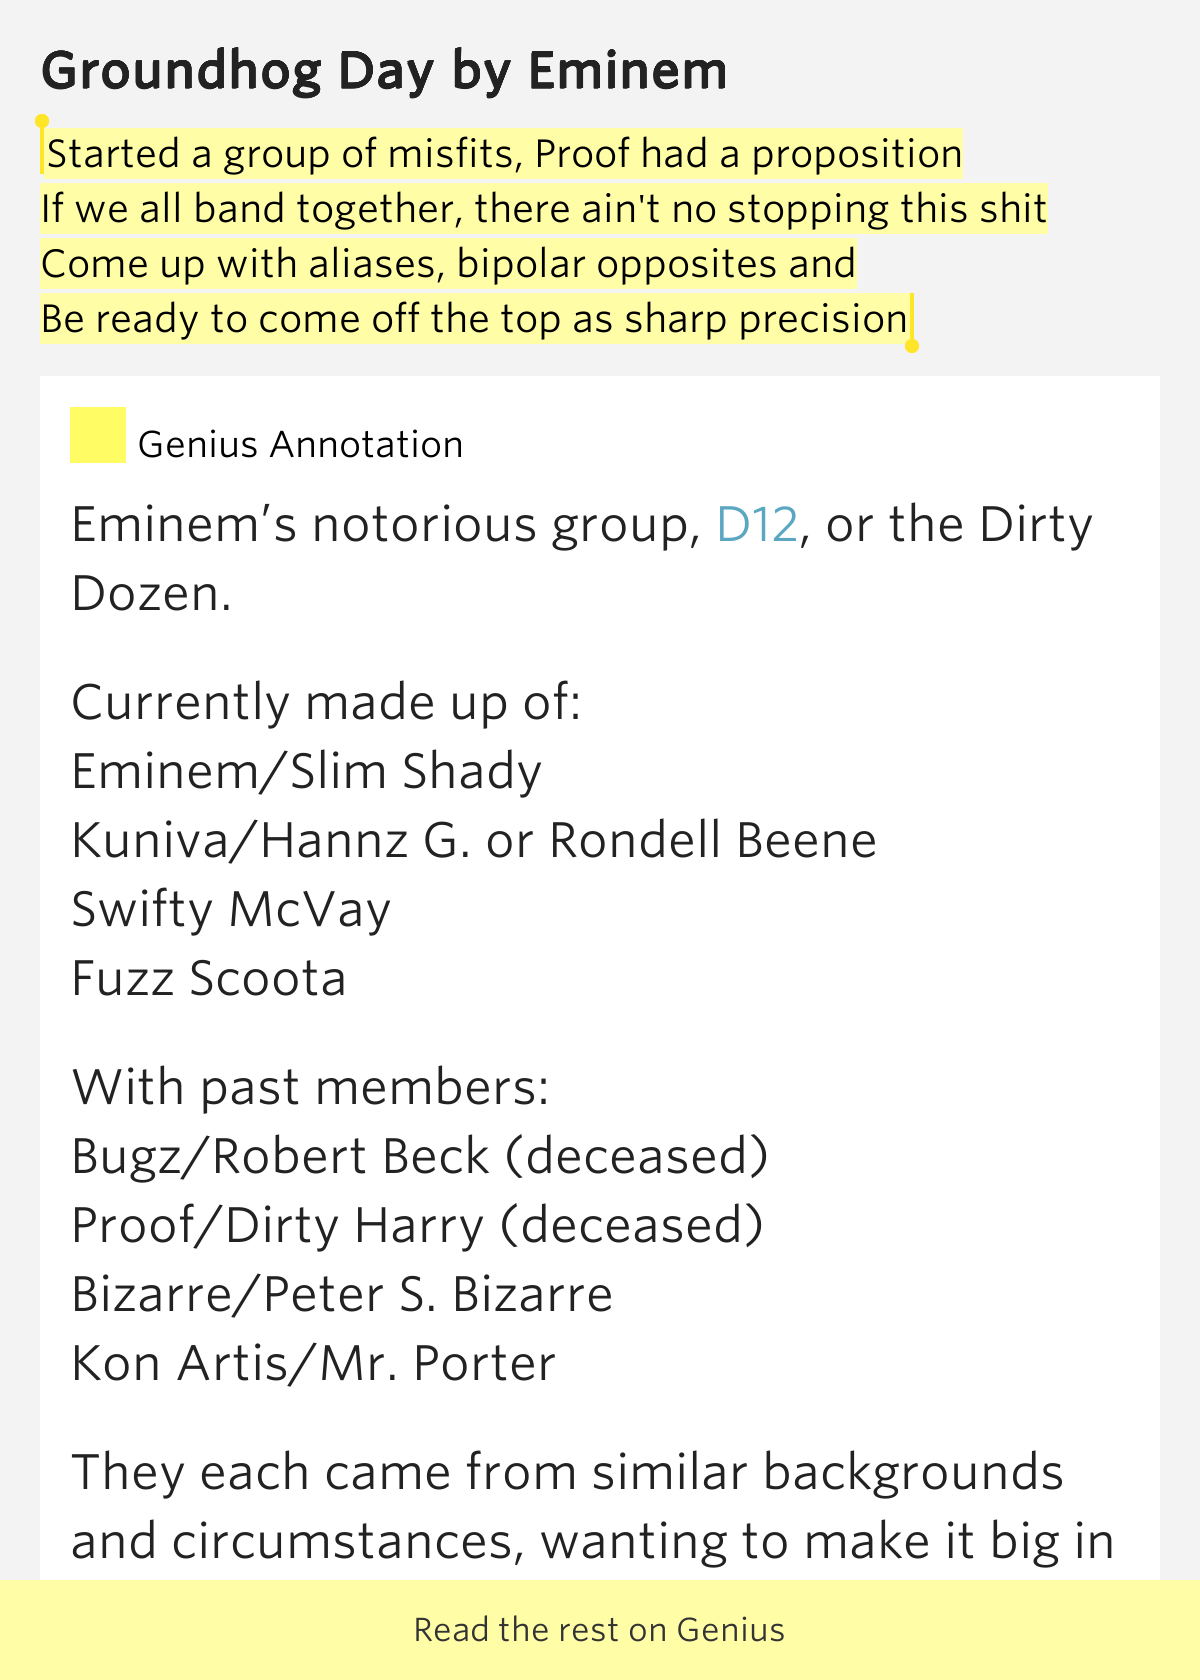 Eminem Song - Groundhog Day Lyrics - Lyrics n Video